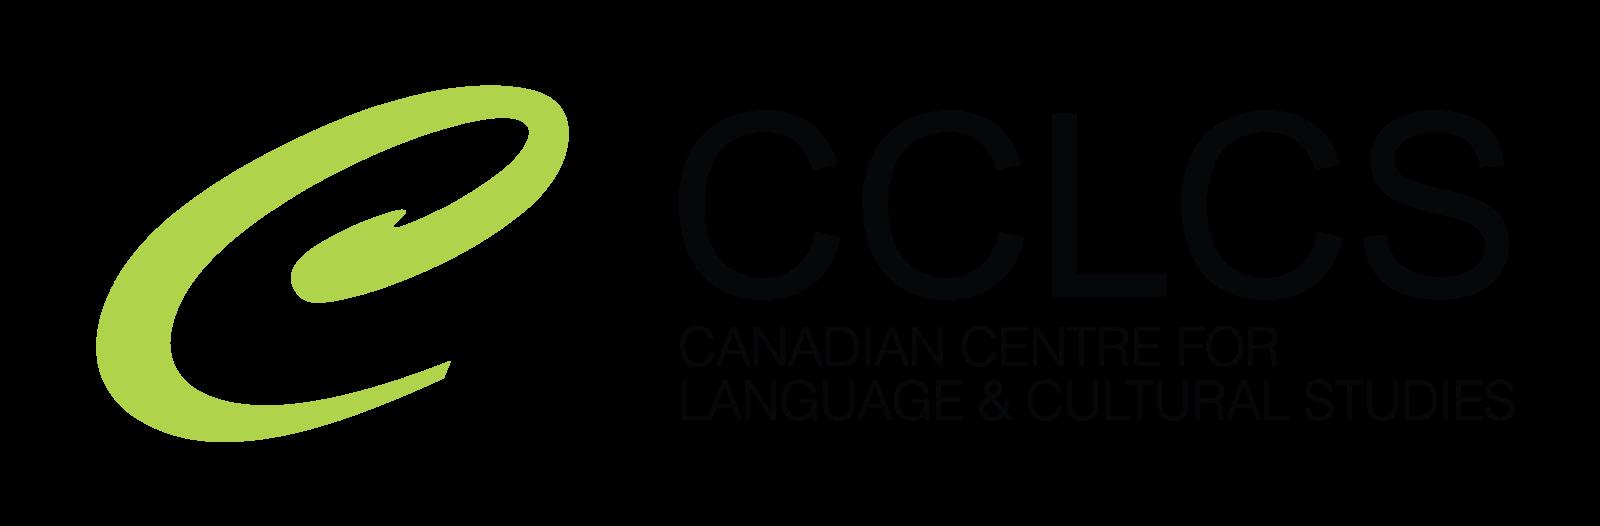 Canadian Centre for Language & Cultural Studies, INC. (CCLCS)